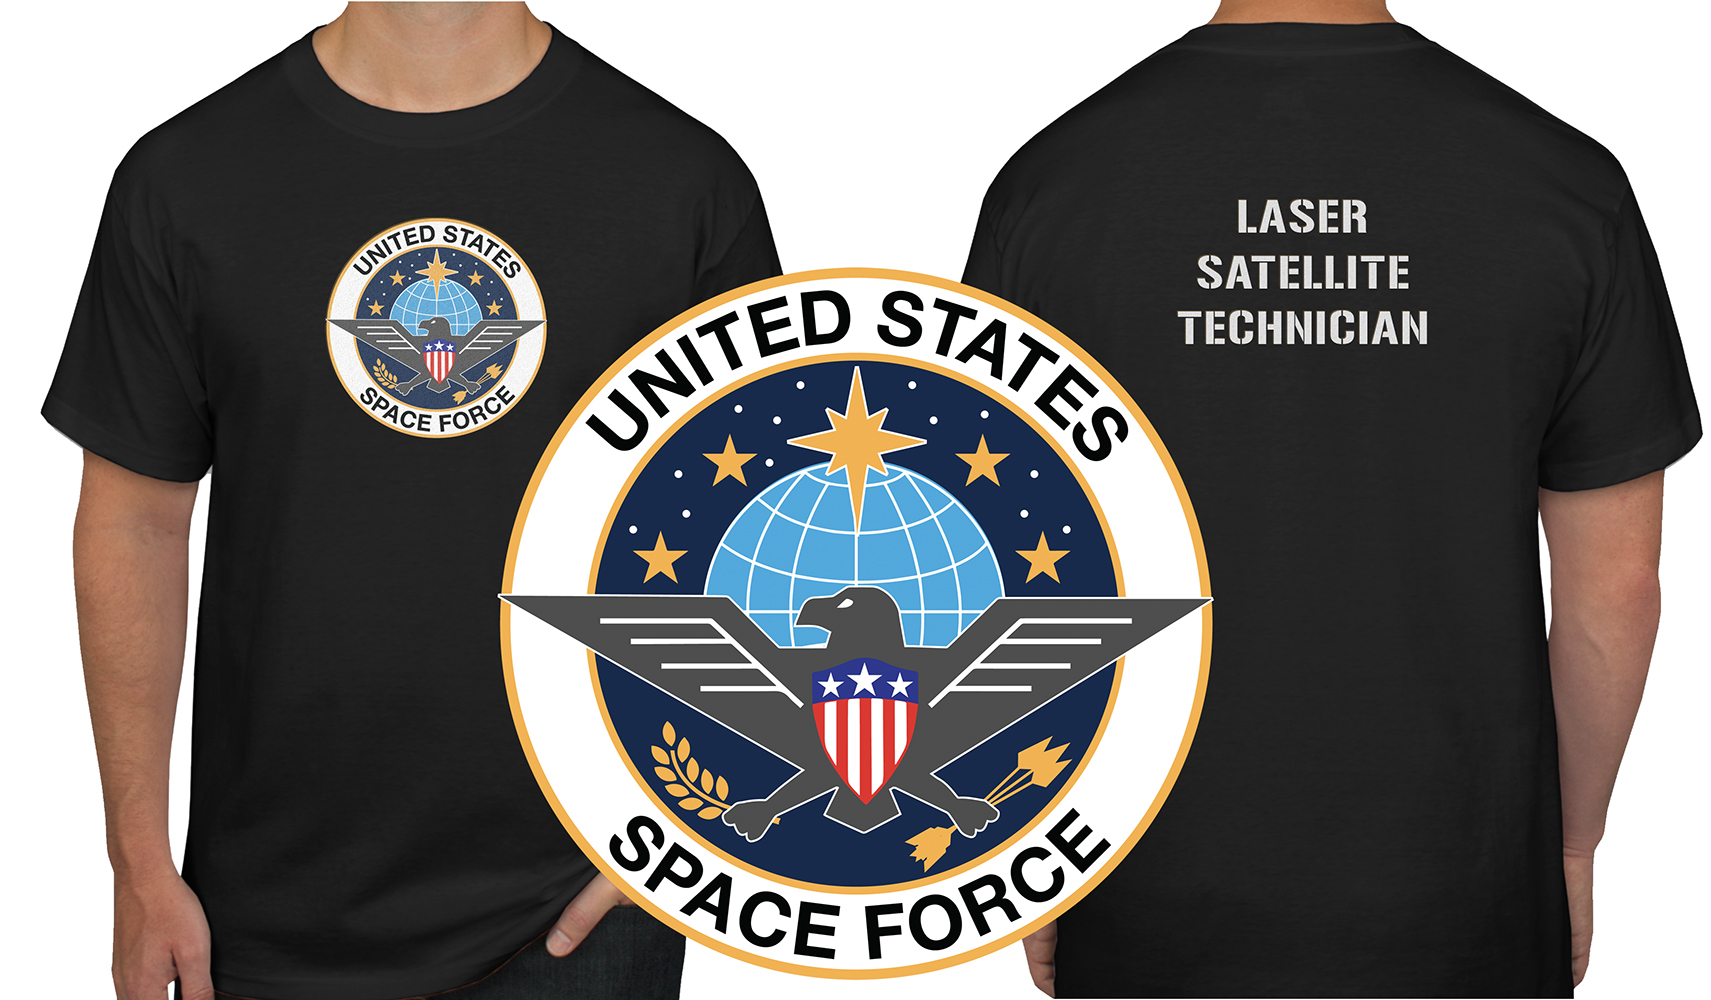 Laser Satellite Technician